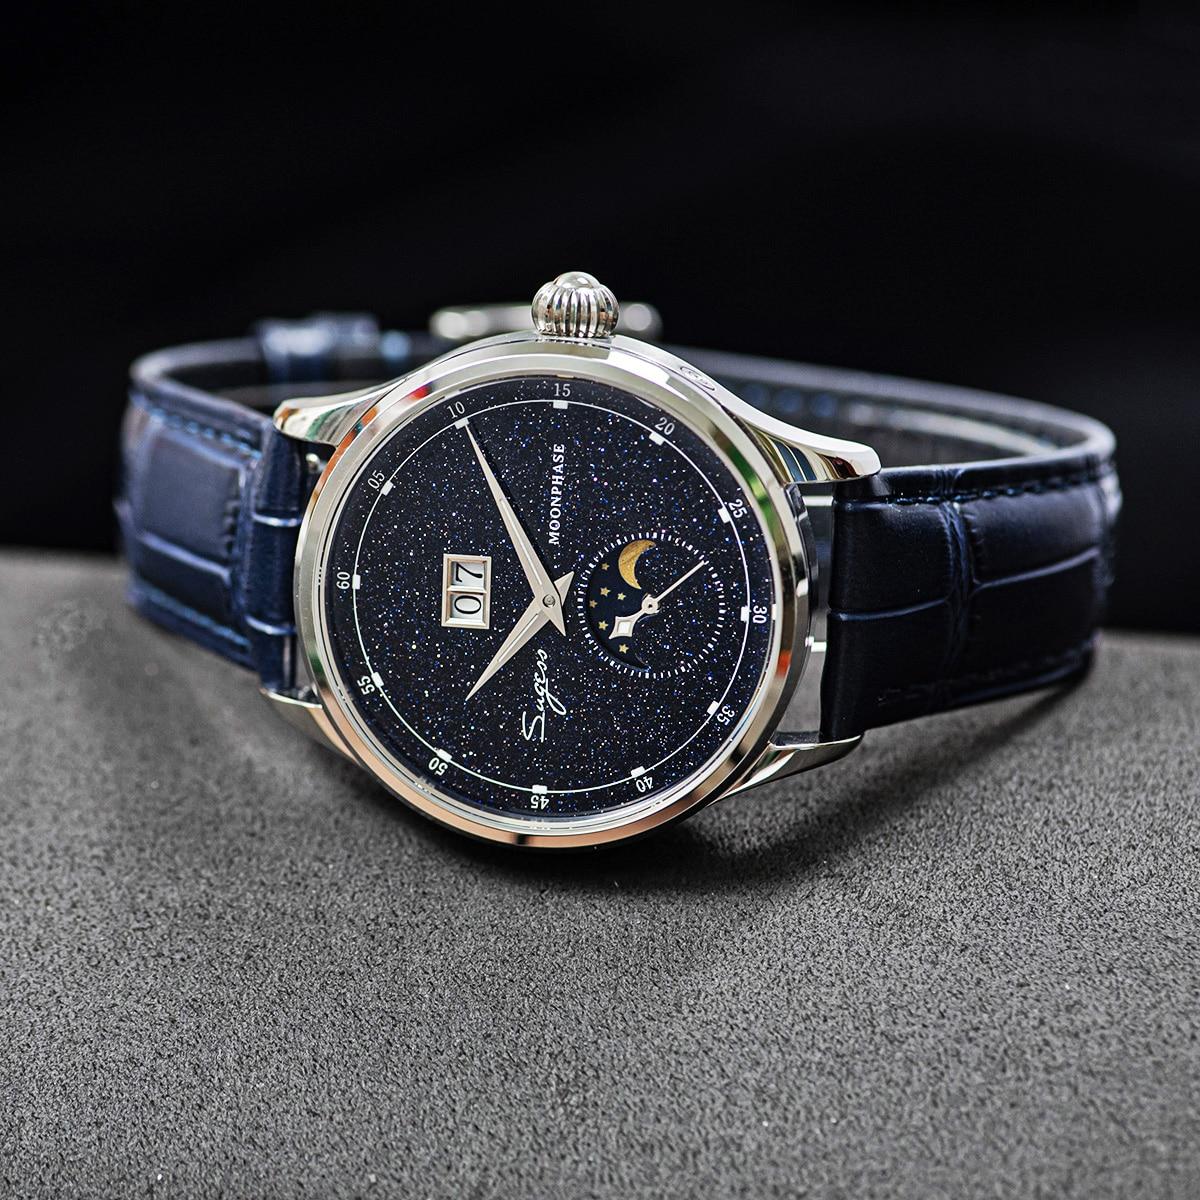 Sugess النورس ST2528 حركة الميكانيكية ساعة اليد الرجال الفاخرة ريال الأزرق حجر الاتصال الهاتفي حاوية من الفولاذ المقاوم للصدأ Moonphase ساعة